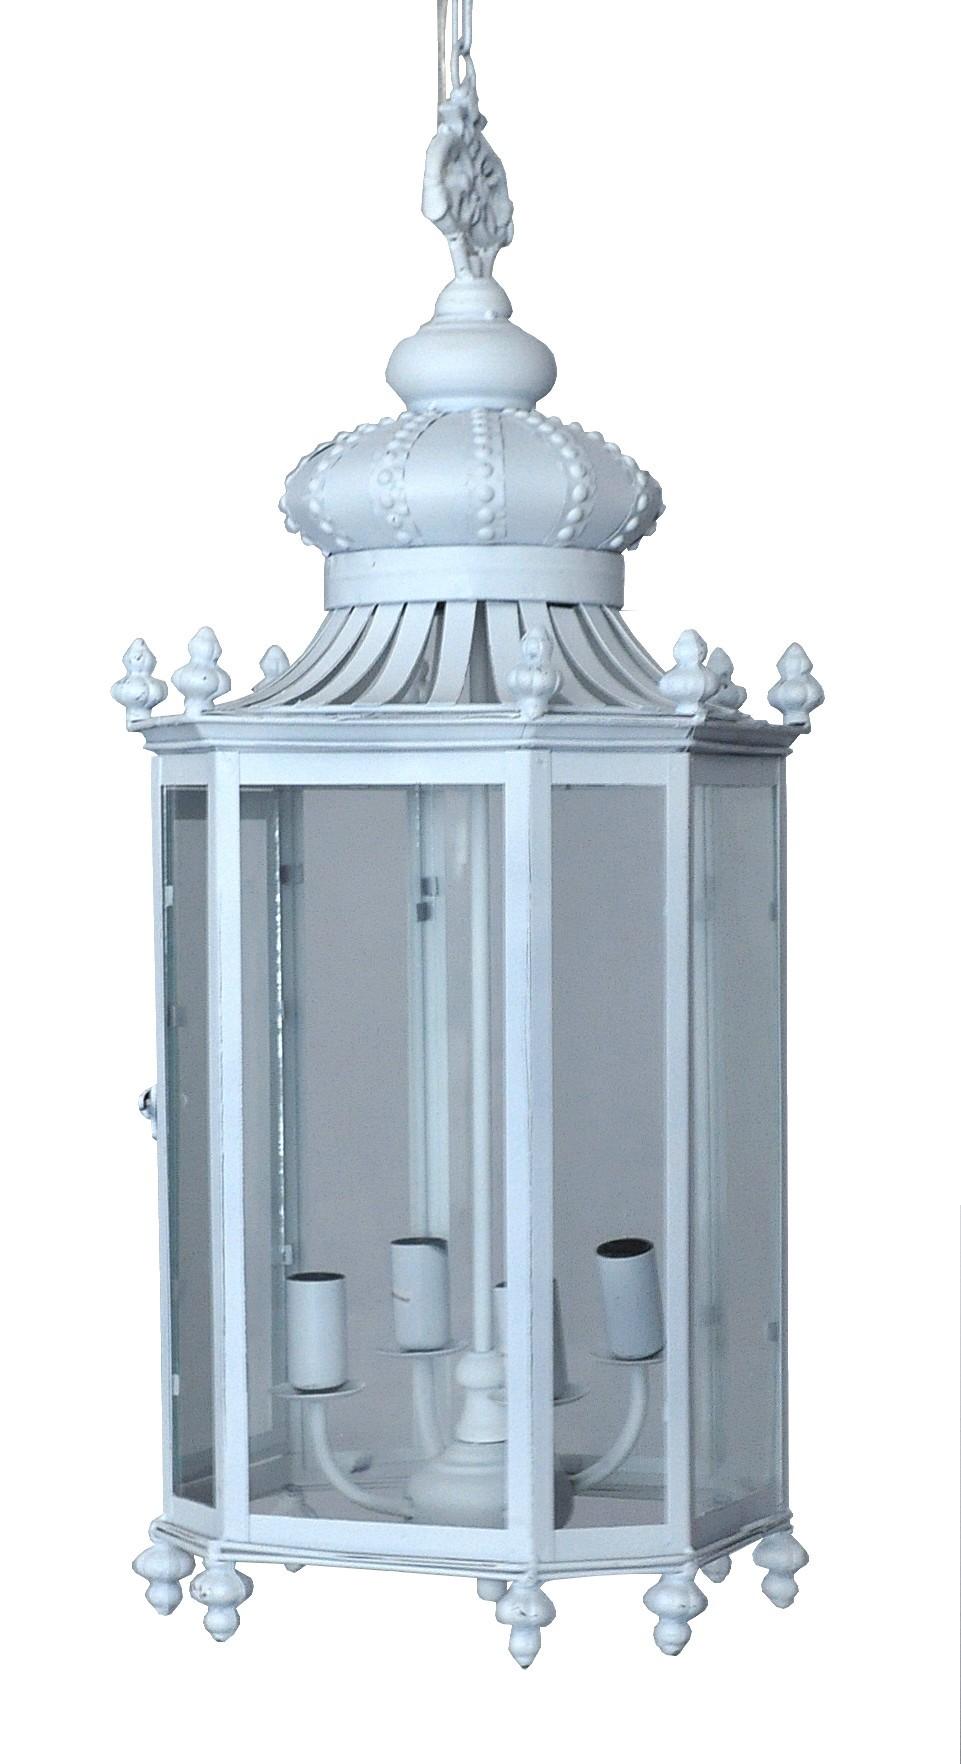 Lanterne fer forg couronne blanche demeure et jardin for Porte lanterne fer forge